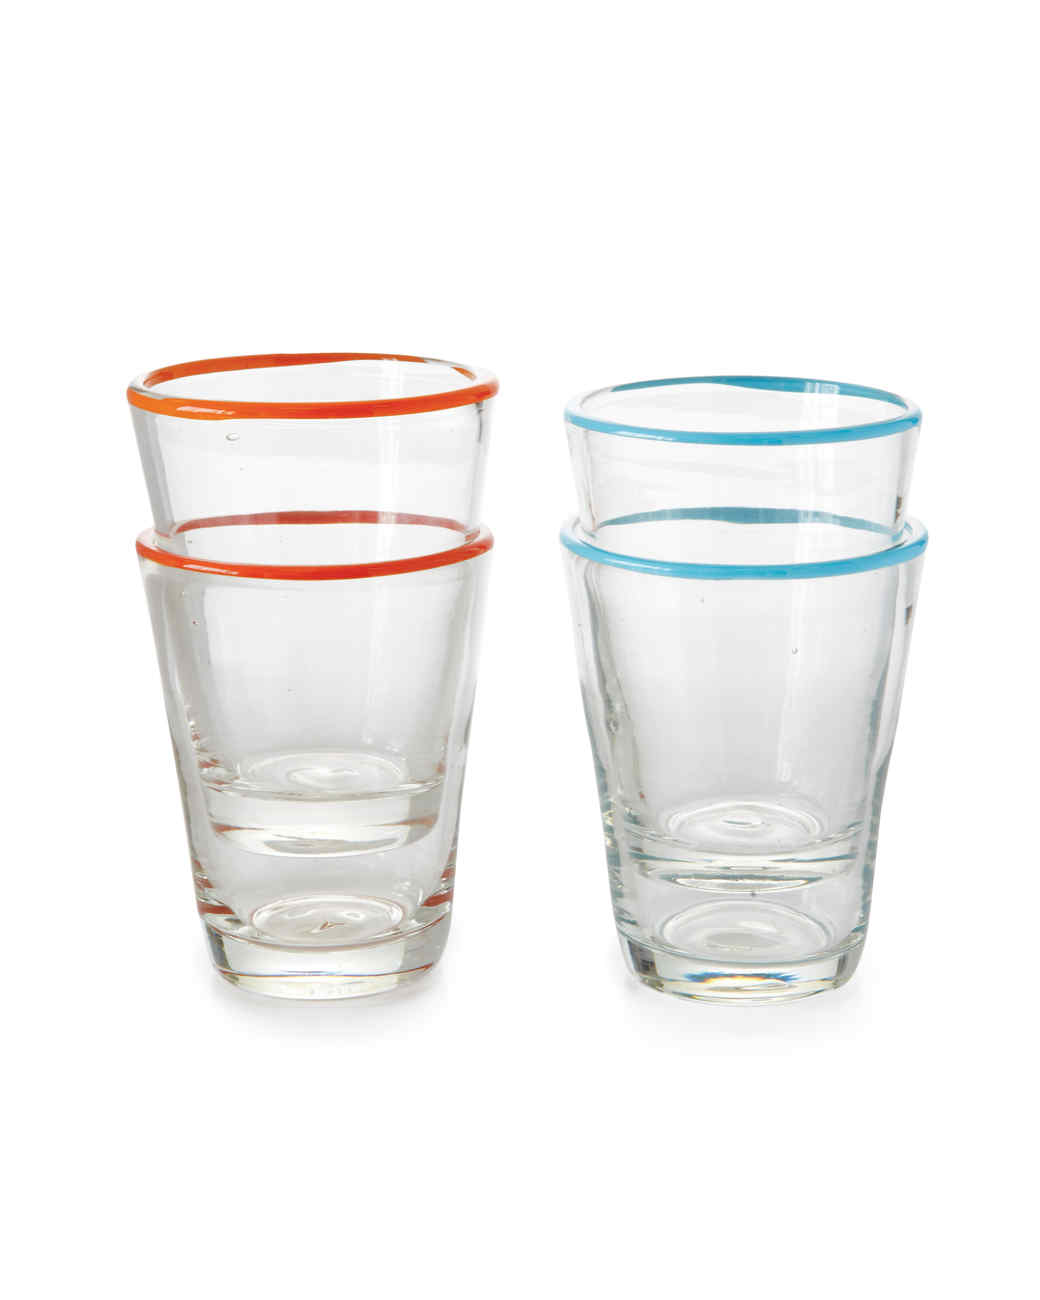 cups-mld108682.jpg